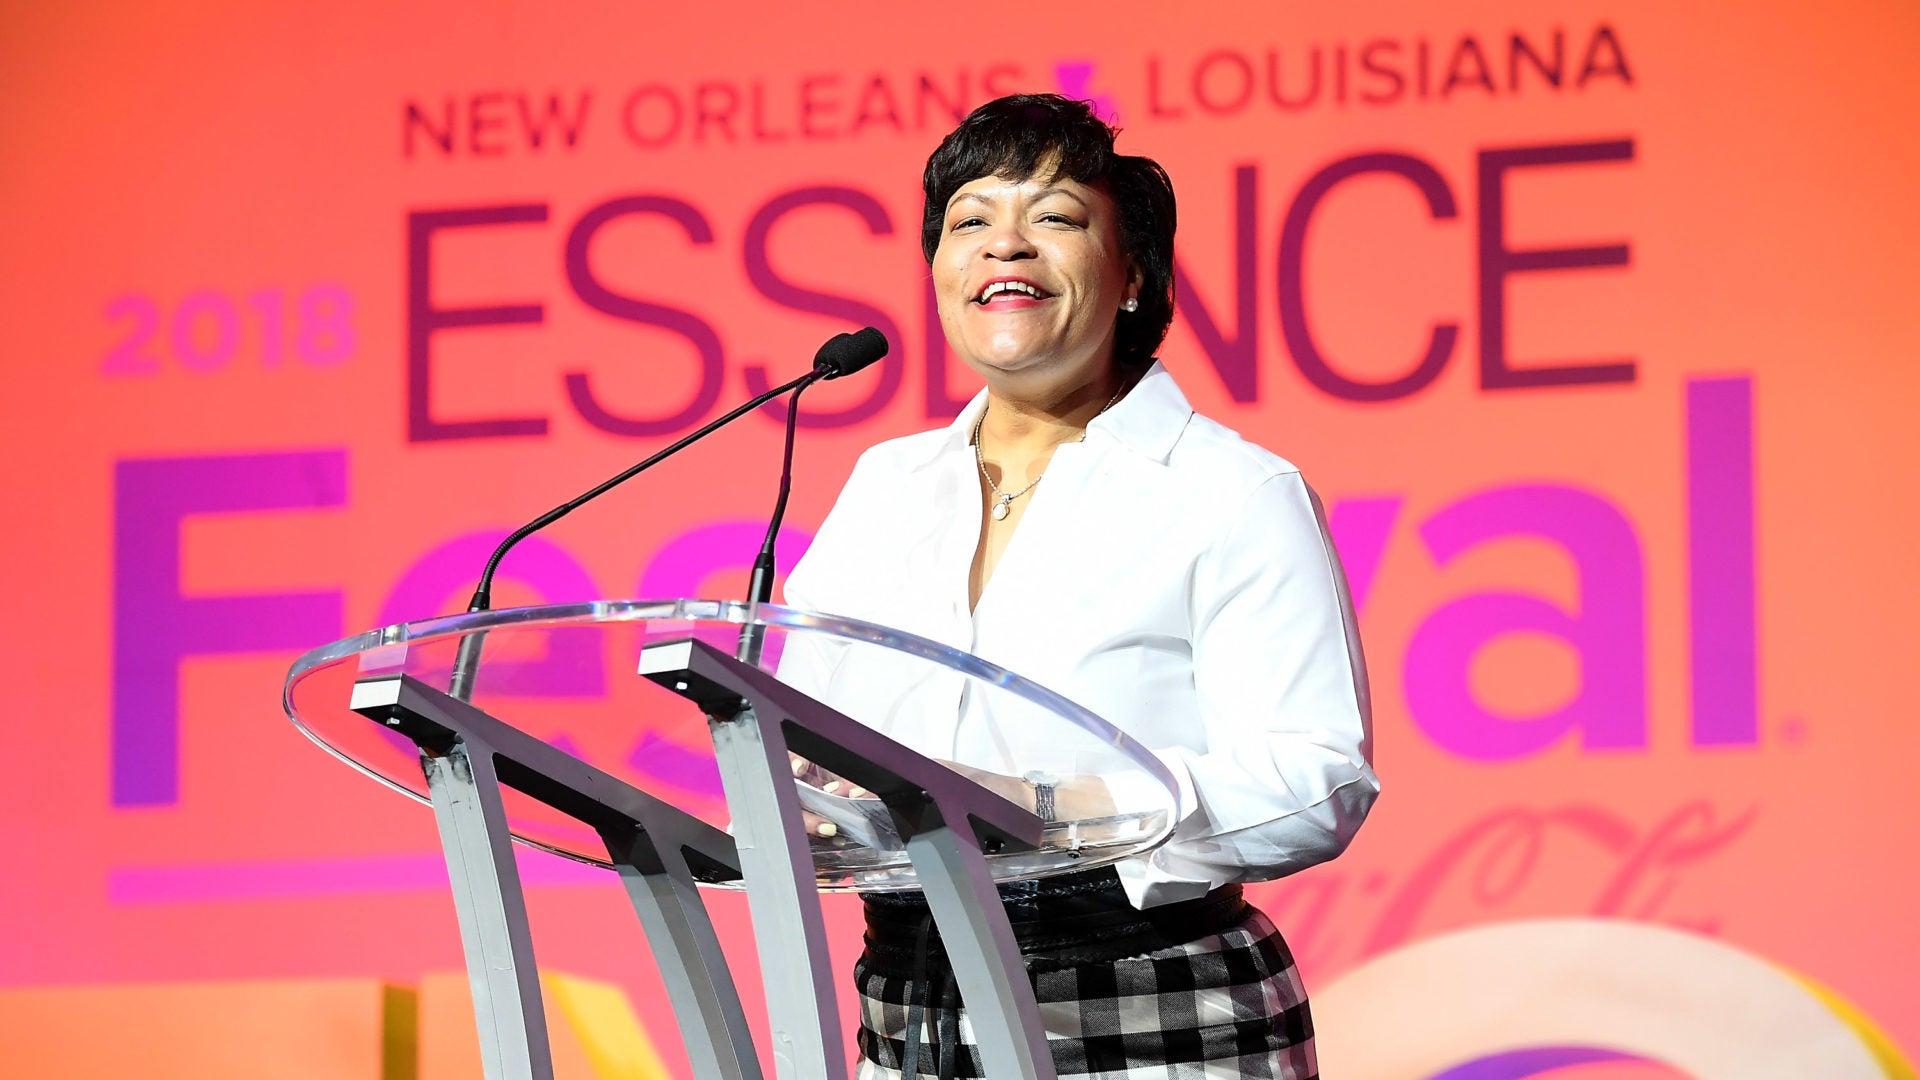 NOLA Mayor LaToya Cantrell Wants City Residents To Feel Essence Festival Impact